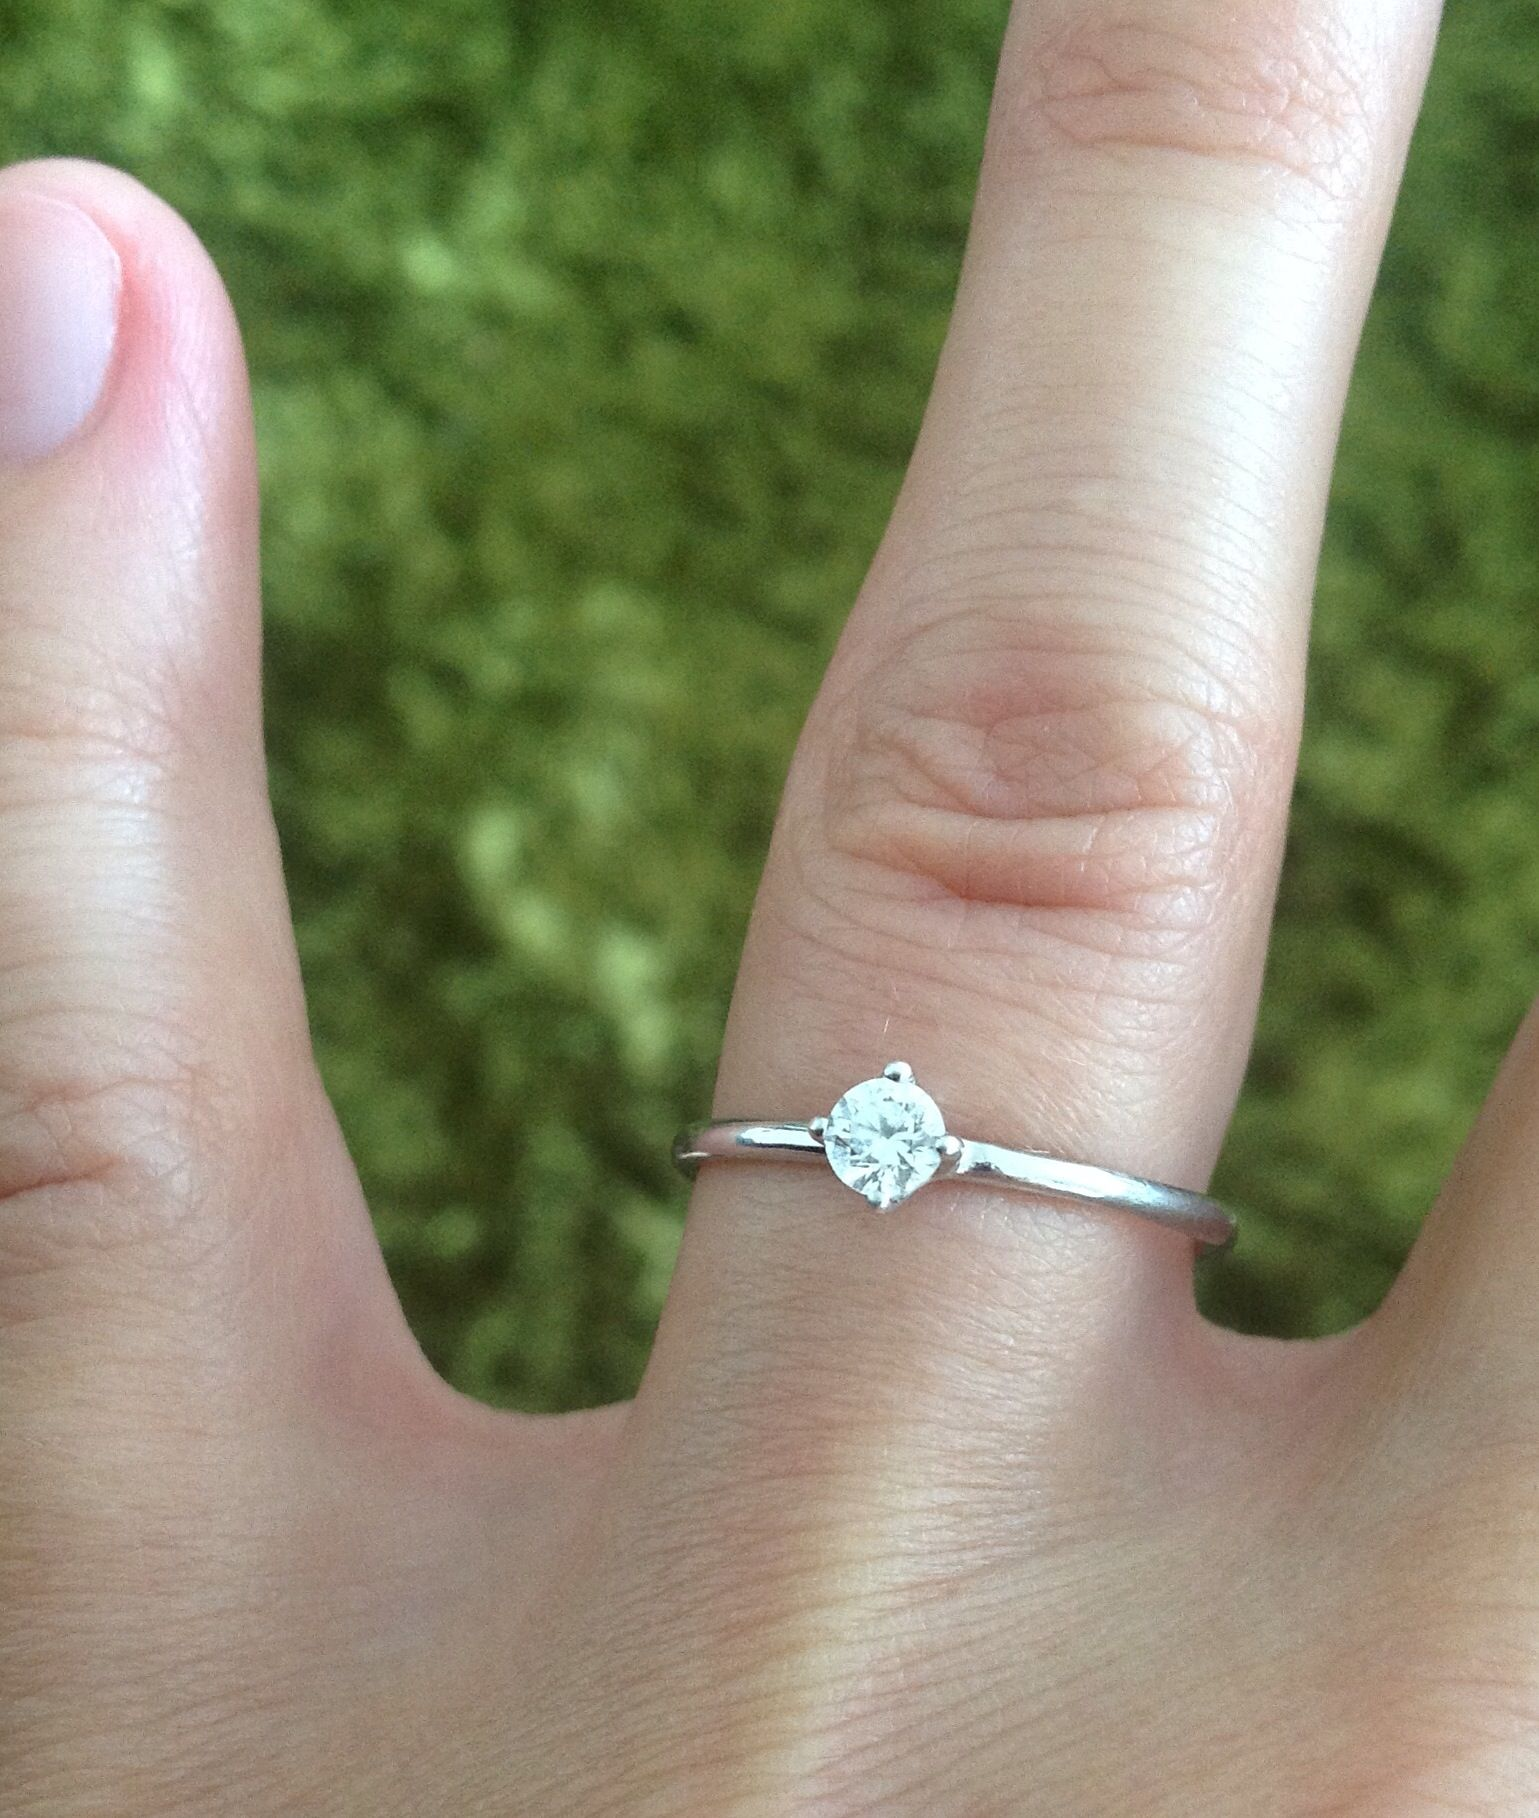 My Bling Bling Engagement Ring Mein Verlobungsring